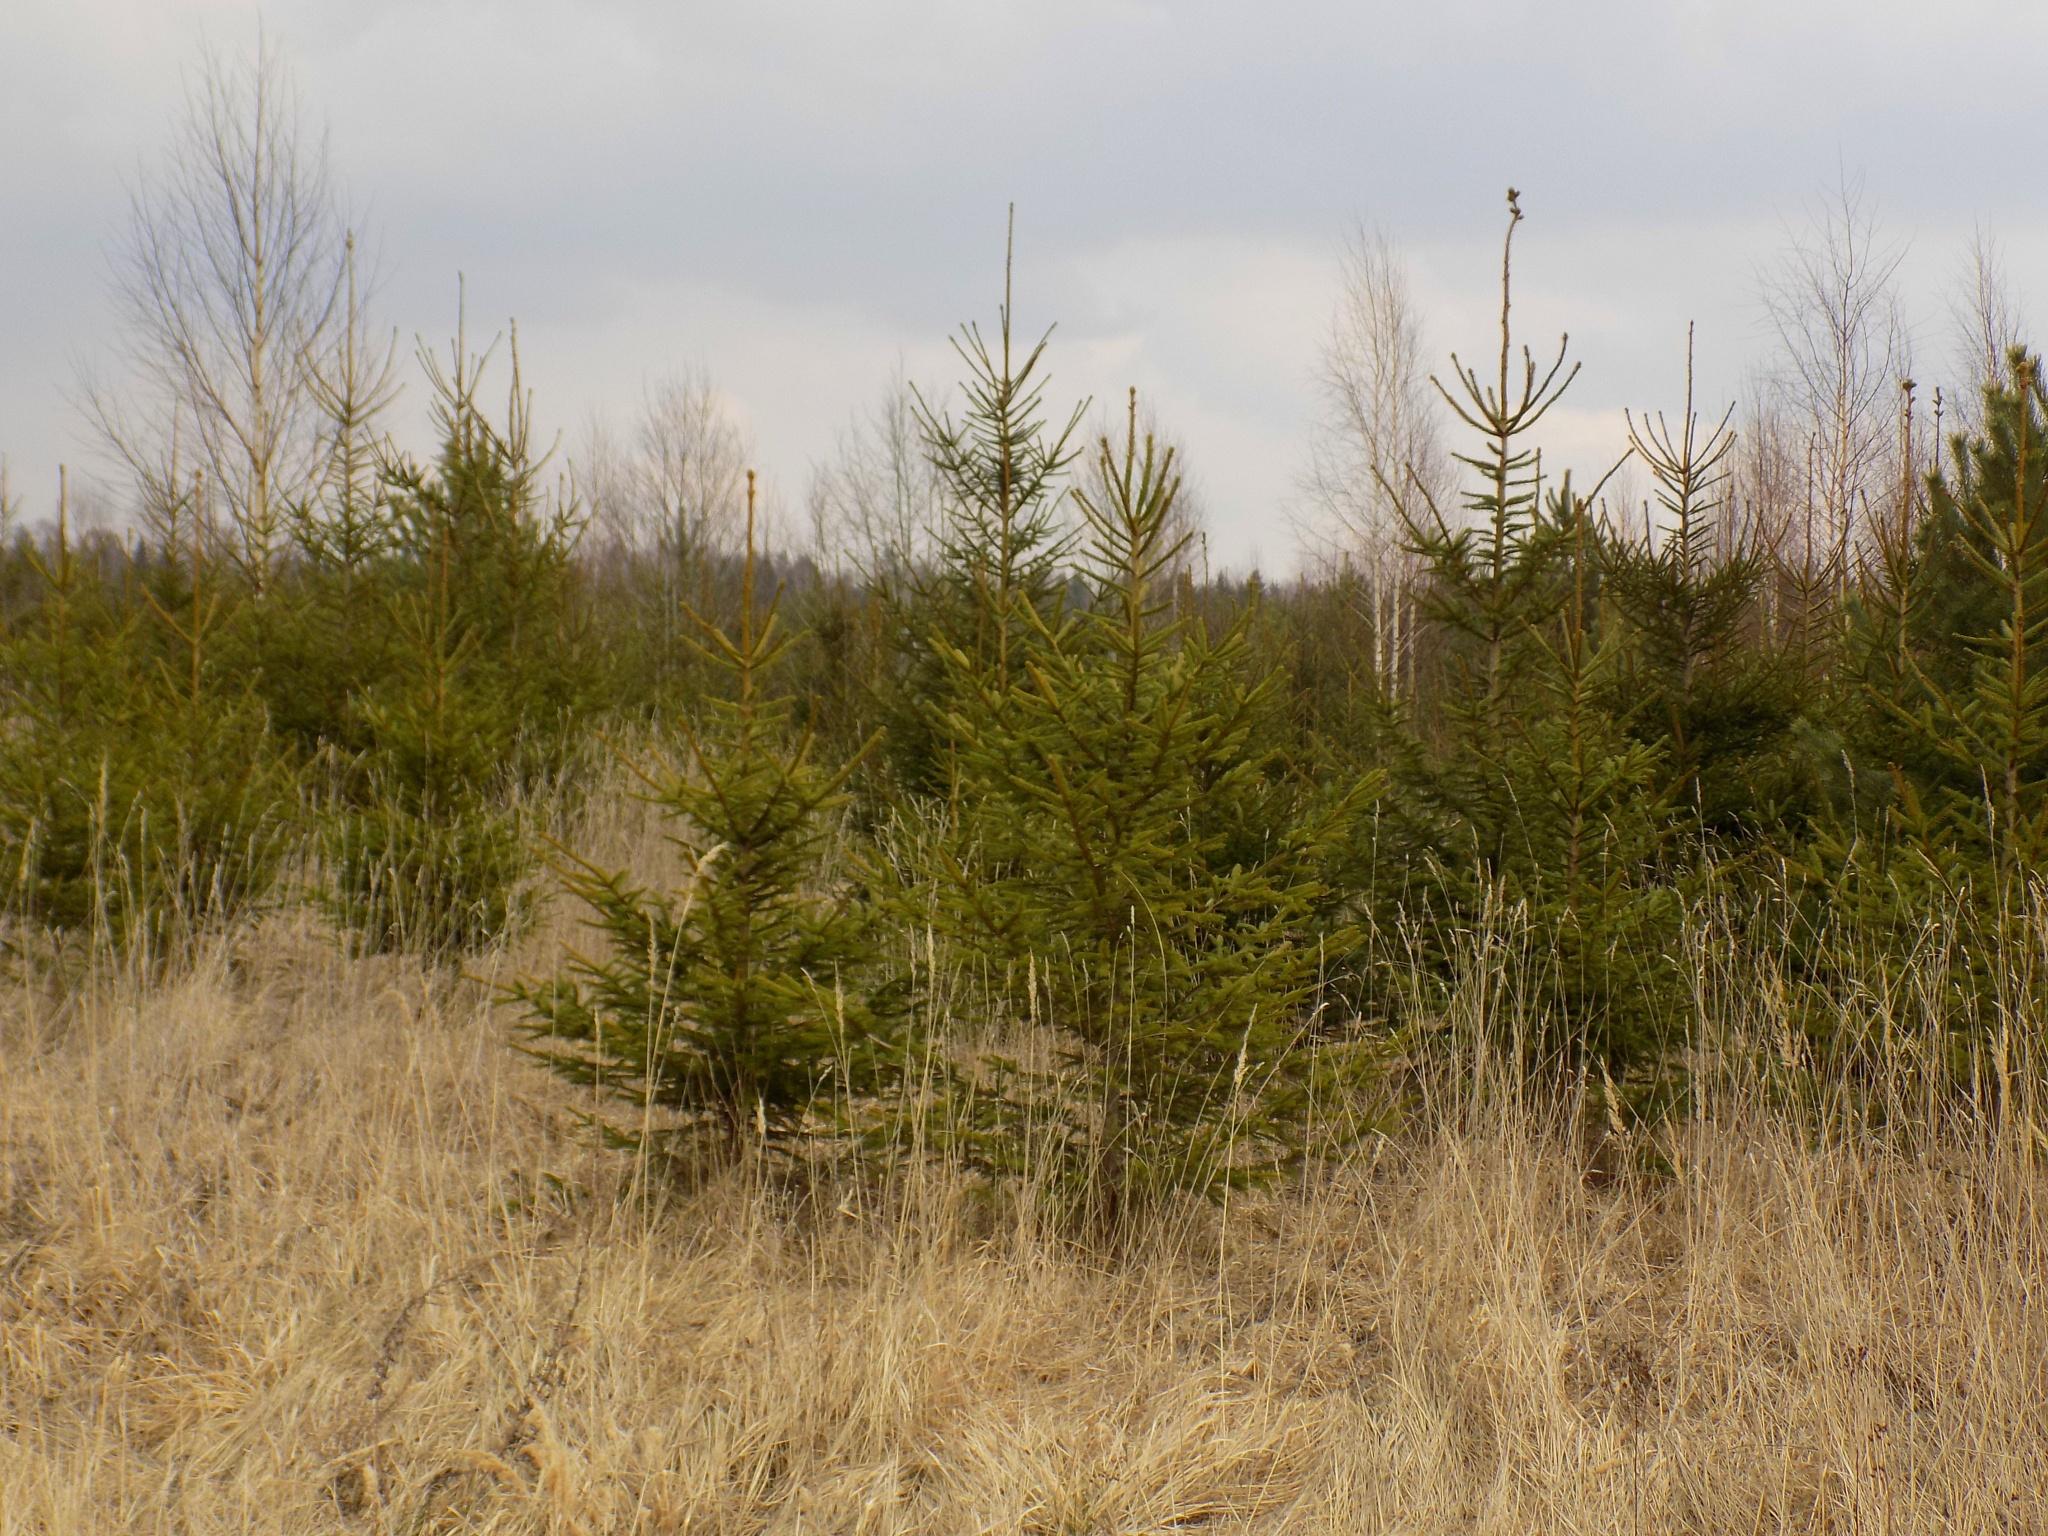 Outskirts trees by uzkuraitiene62